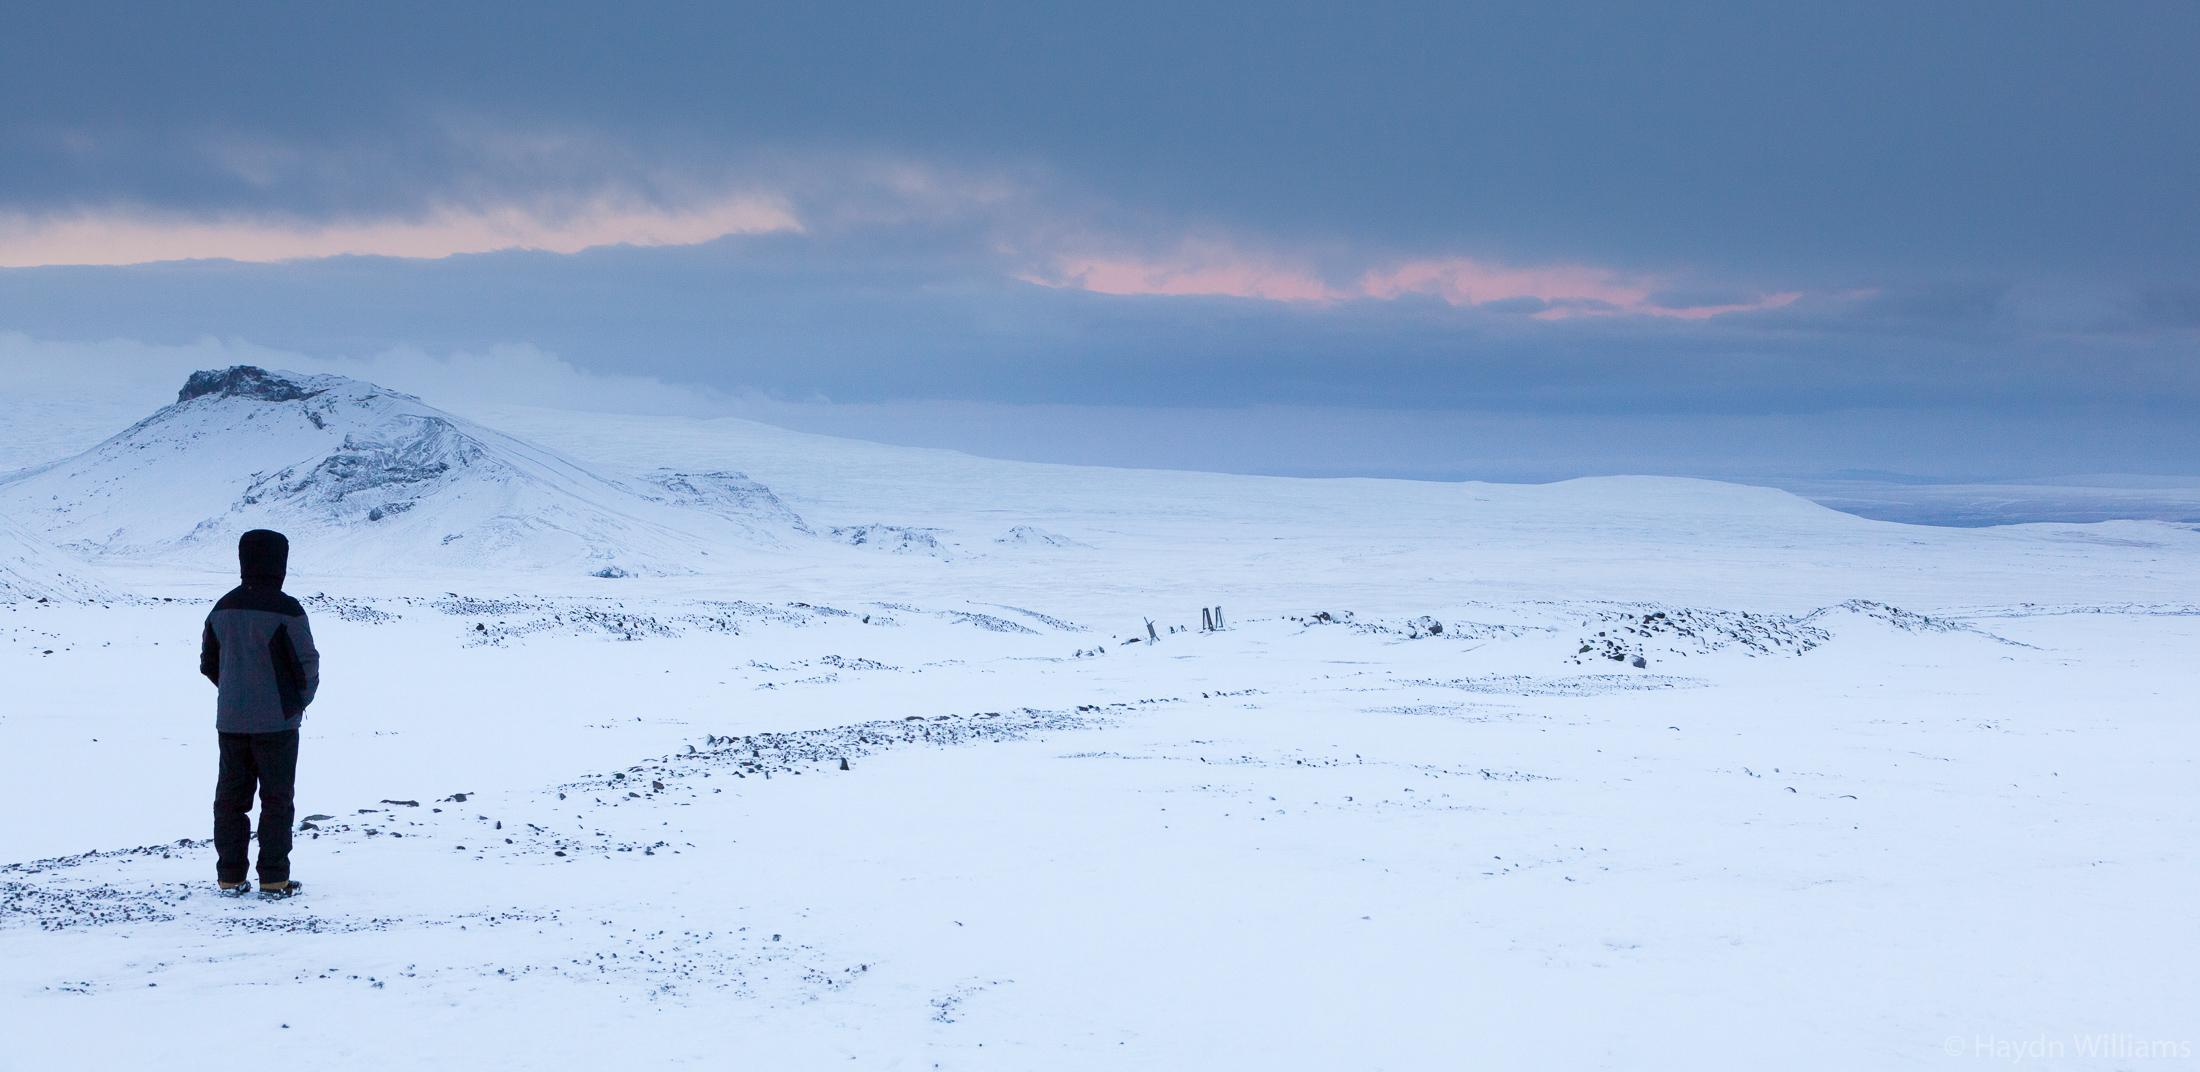 View from Klaki base camp below the Langjökull glacier. © Haydn Williams 2019